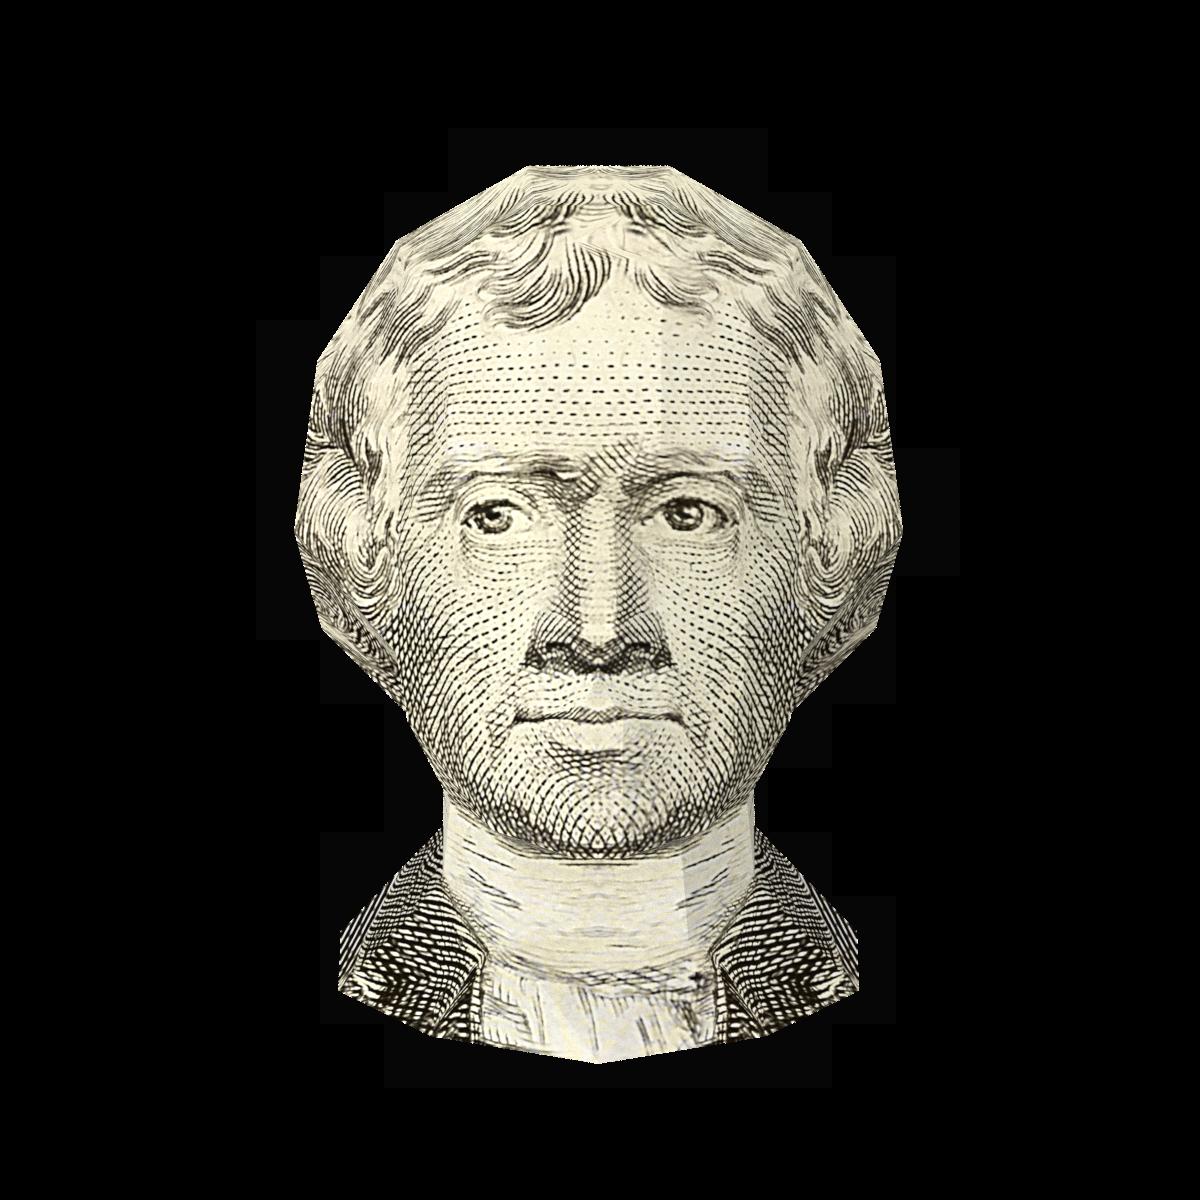 US $2 Bill- Thomas Jefferson